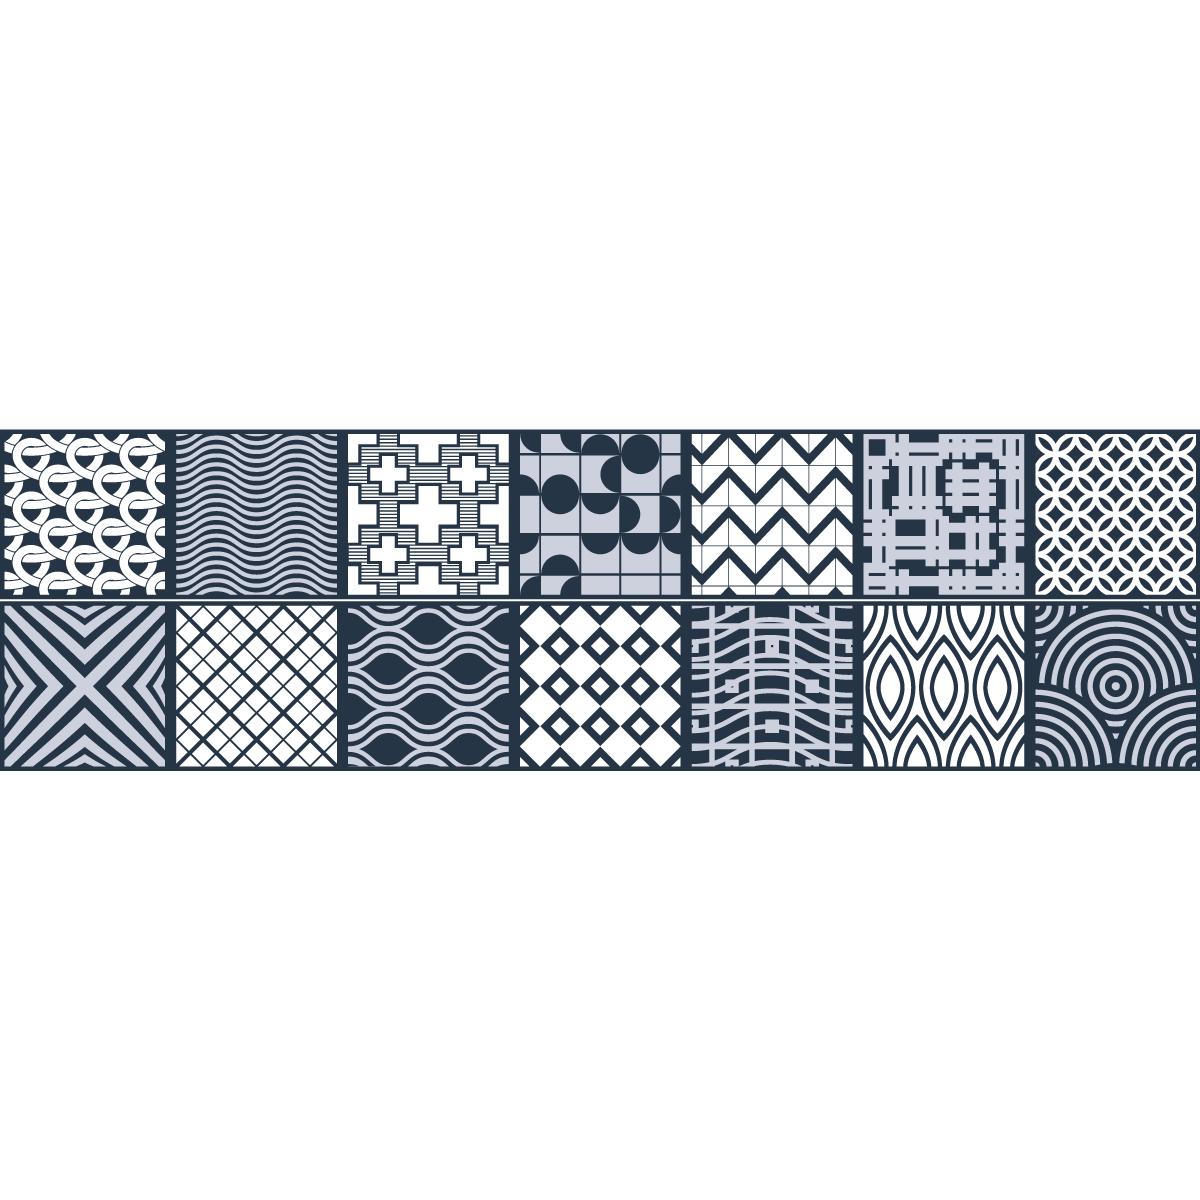 stickers escalier carreaux de ciment yorik x 2 ambiance sticker col stairs ros b060 stickers. Black Bedroom Furniture Sets. Home Design Ideas